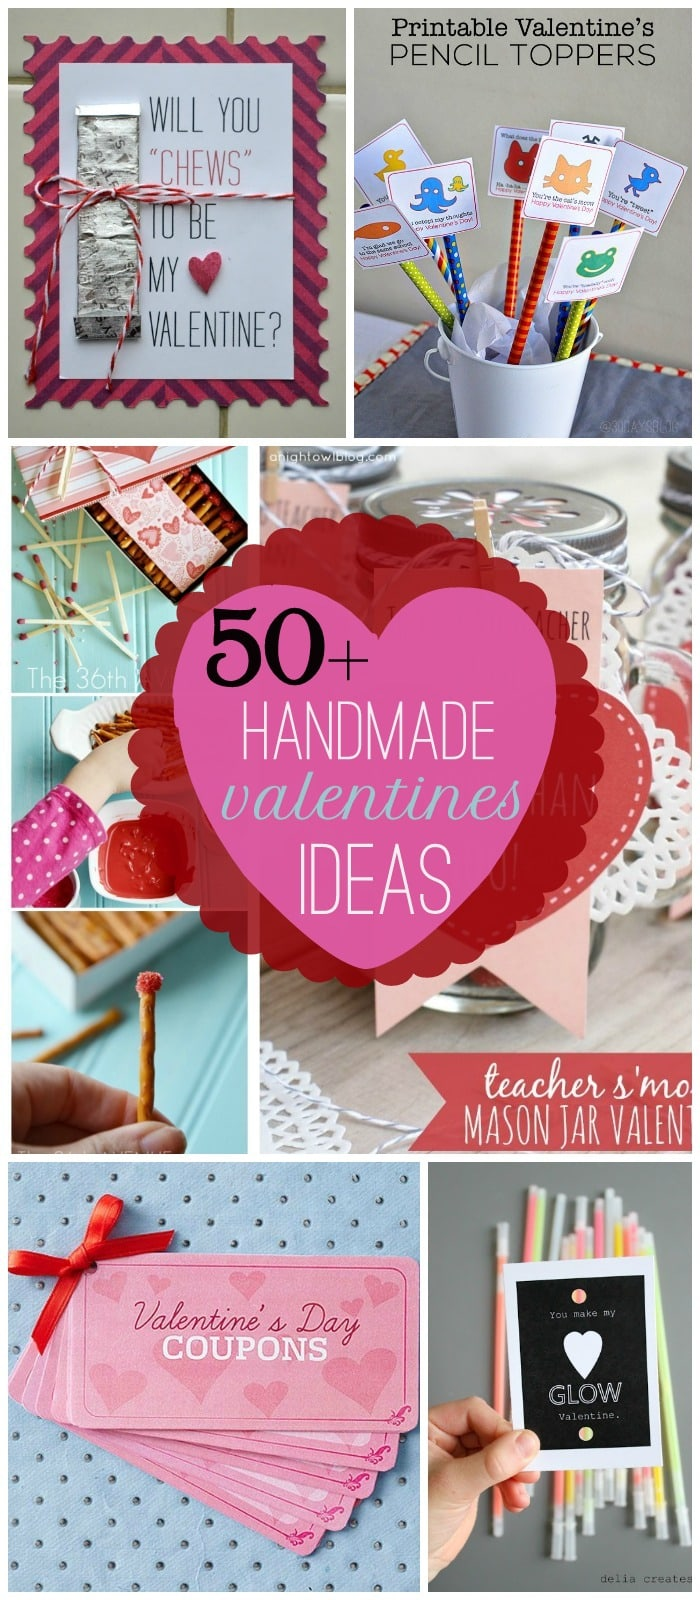 50+ Handmade Valentines Ideas on { lilluna.com } Lots of cute and inexpensive ideas!!